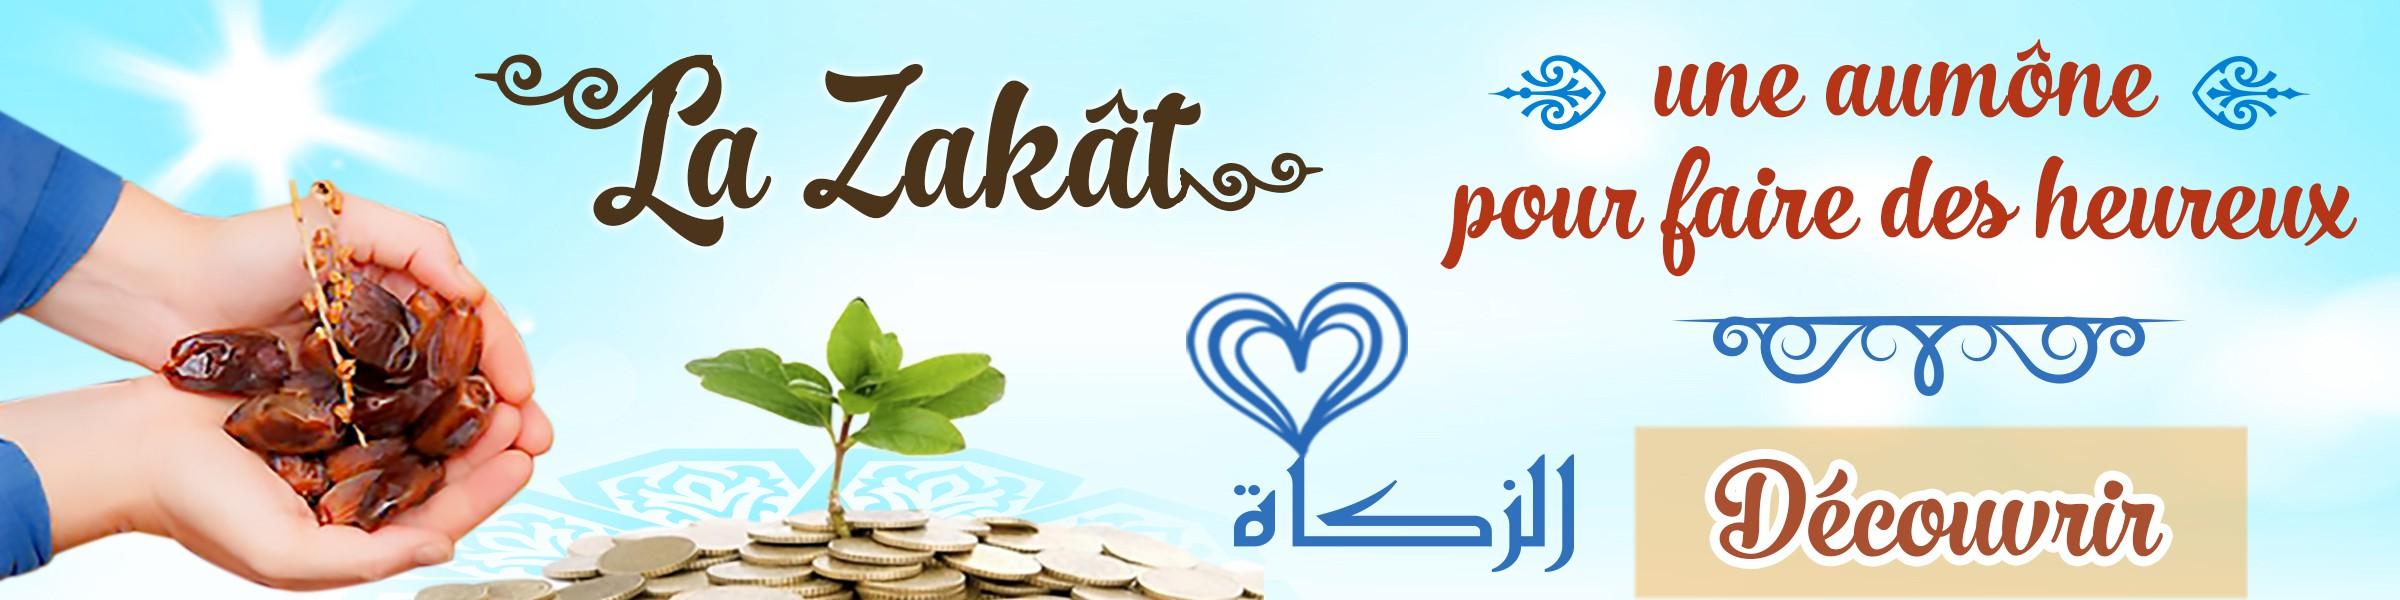 La zakat el fitr (aumône de la rupture du jeûne)